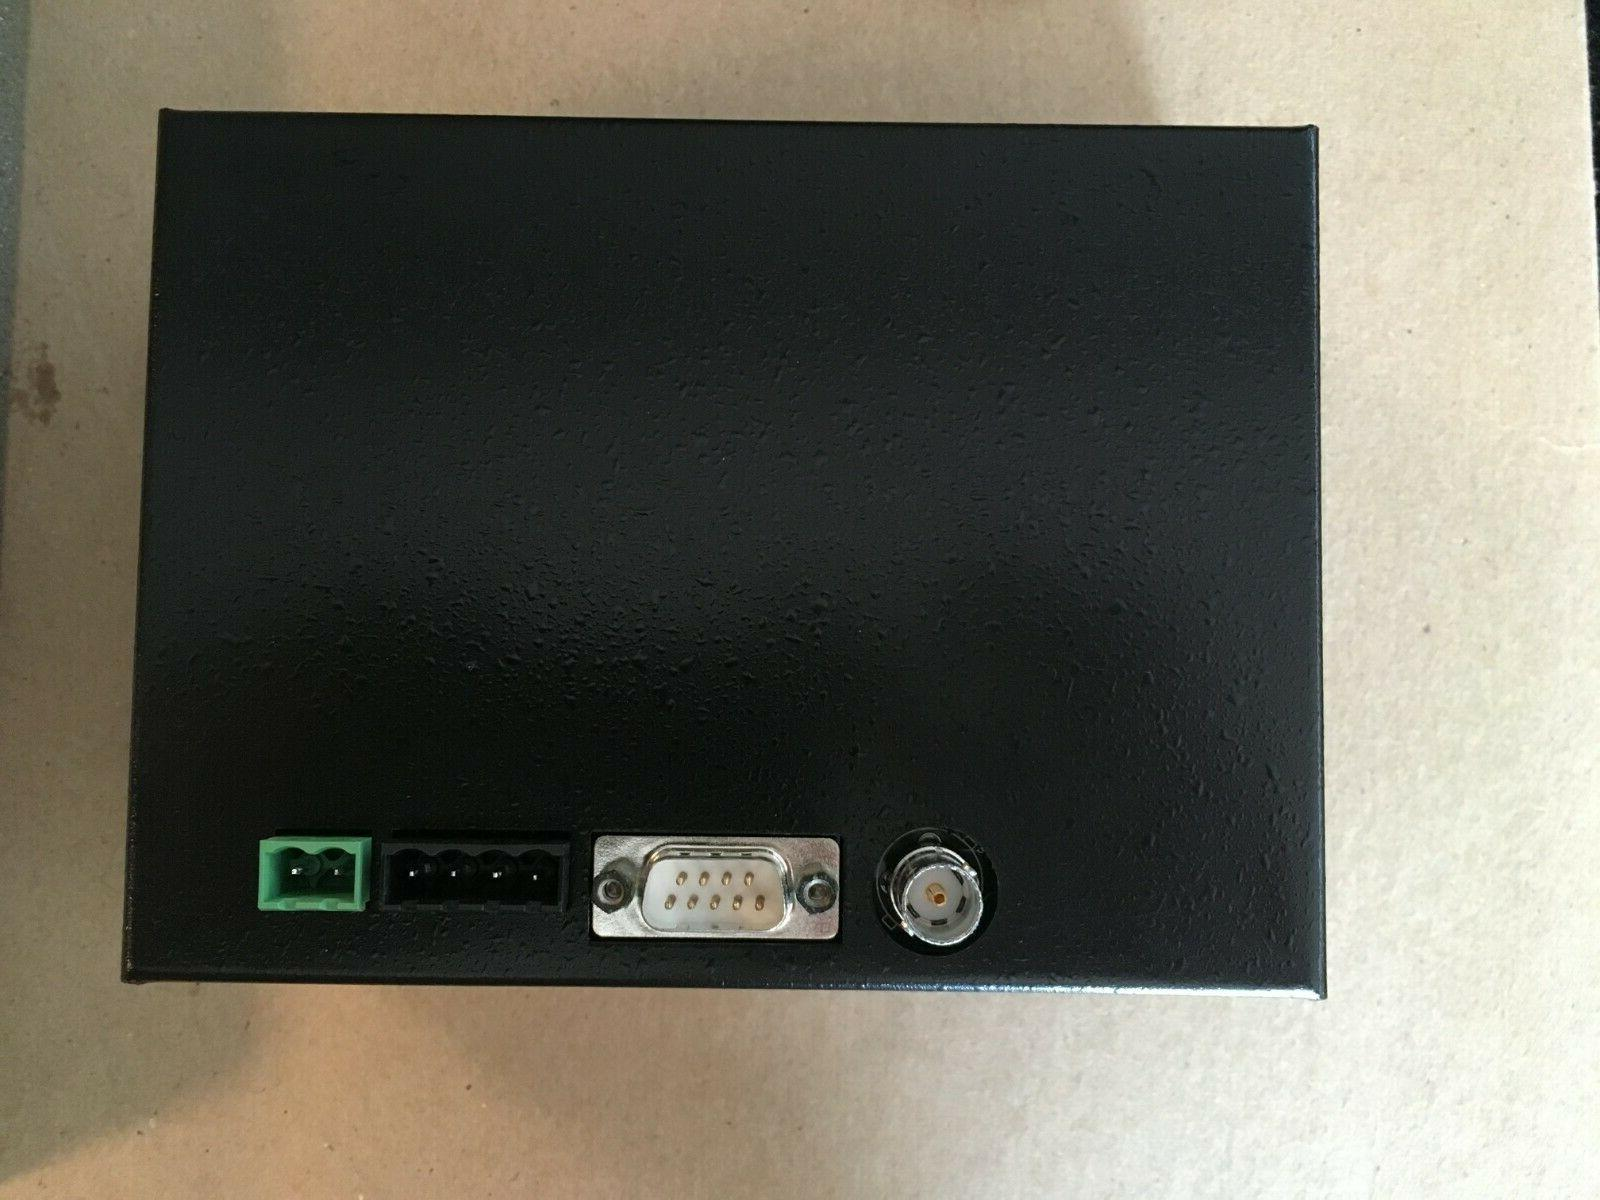 AMX Home Automation Touch Panel Black